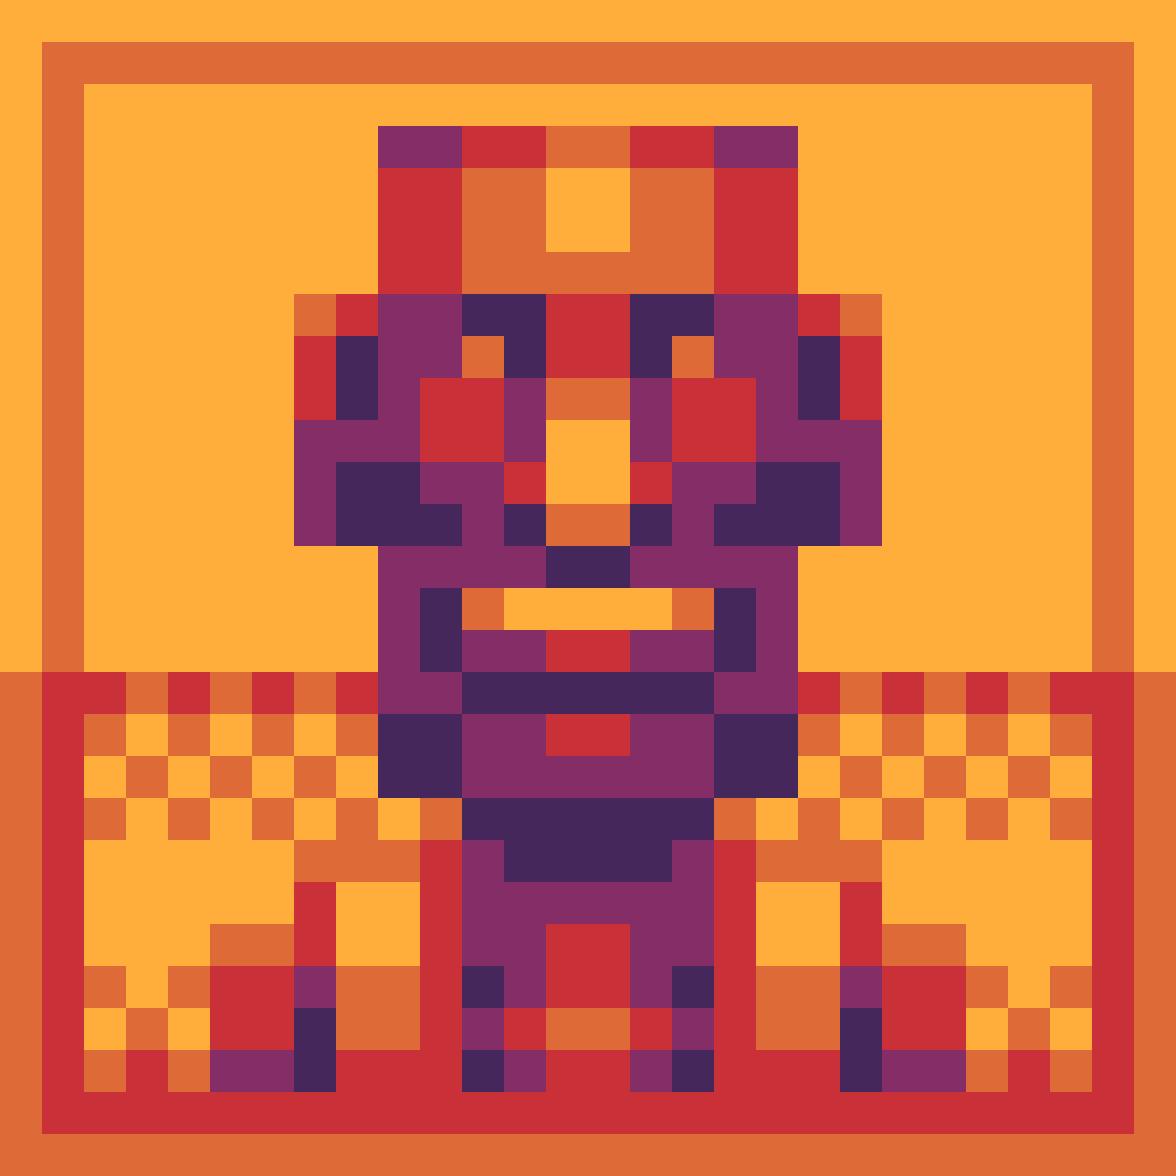 main-image-Dude  by 8-bit-adventure